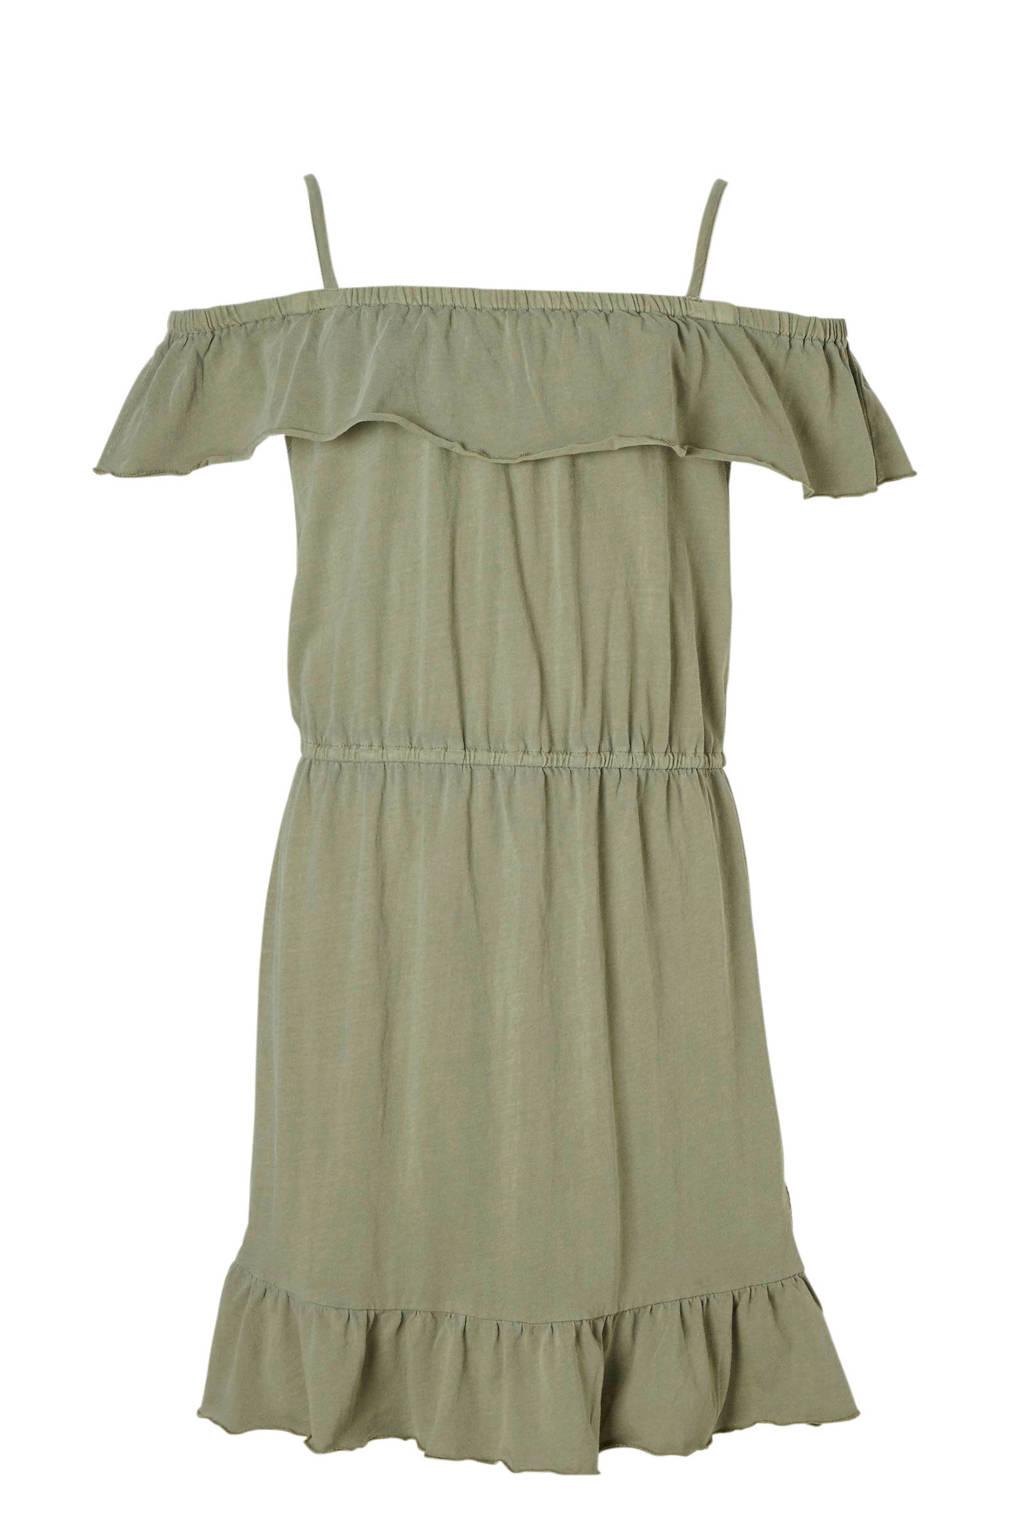 Garcia offshoulder jurk met spaghettibandjes kaki, Kaki